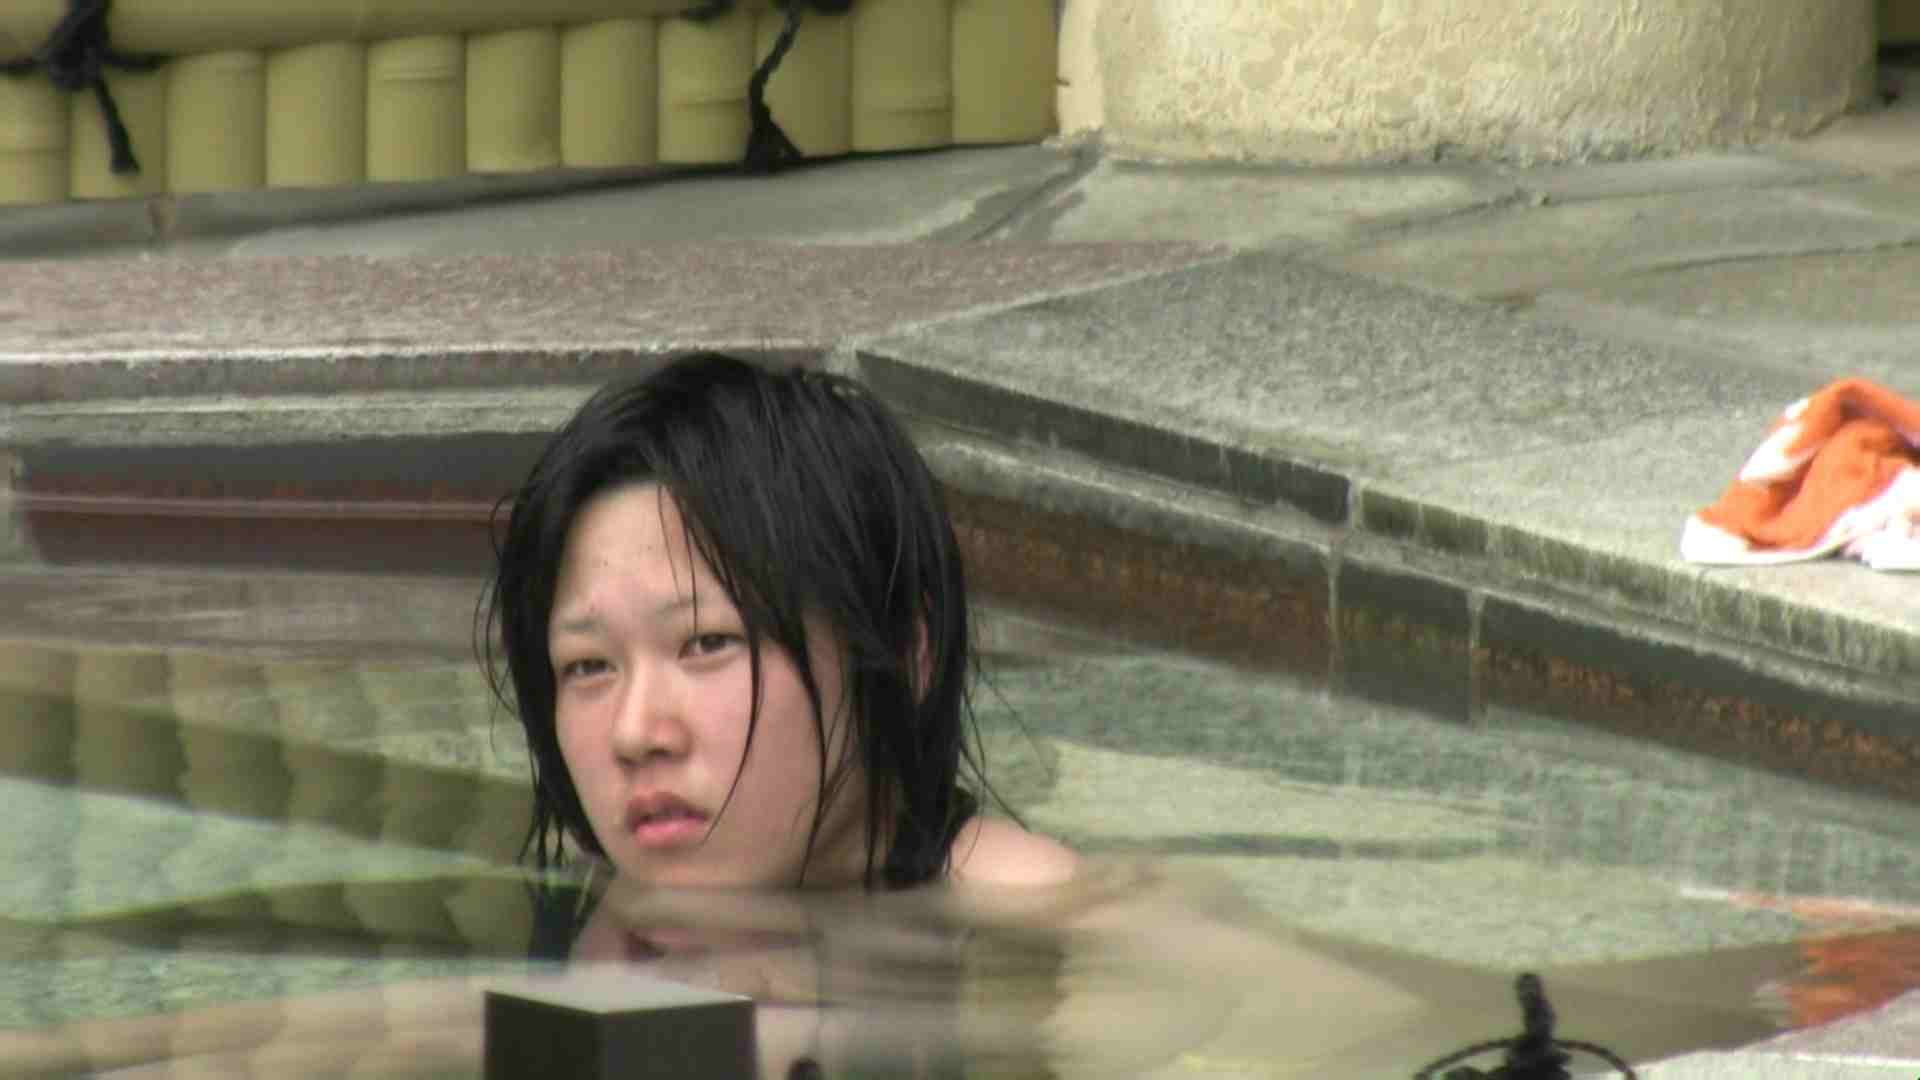 Aquaな露天風呂Vol.36 盗撮 | HなOL  68pic 46